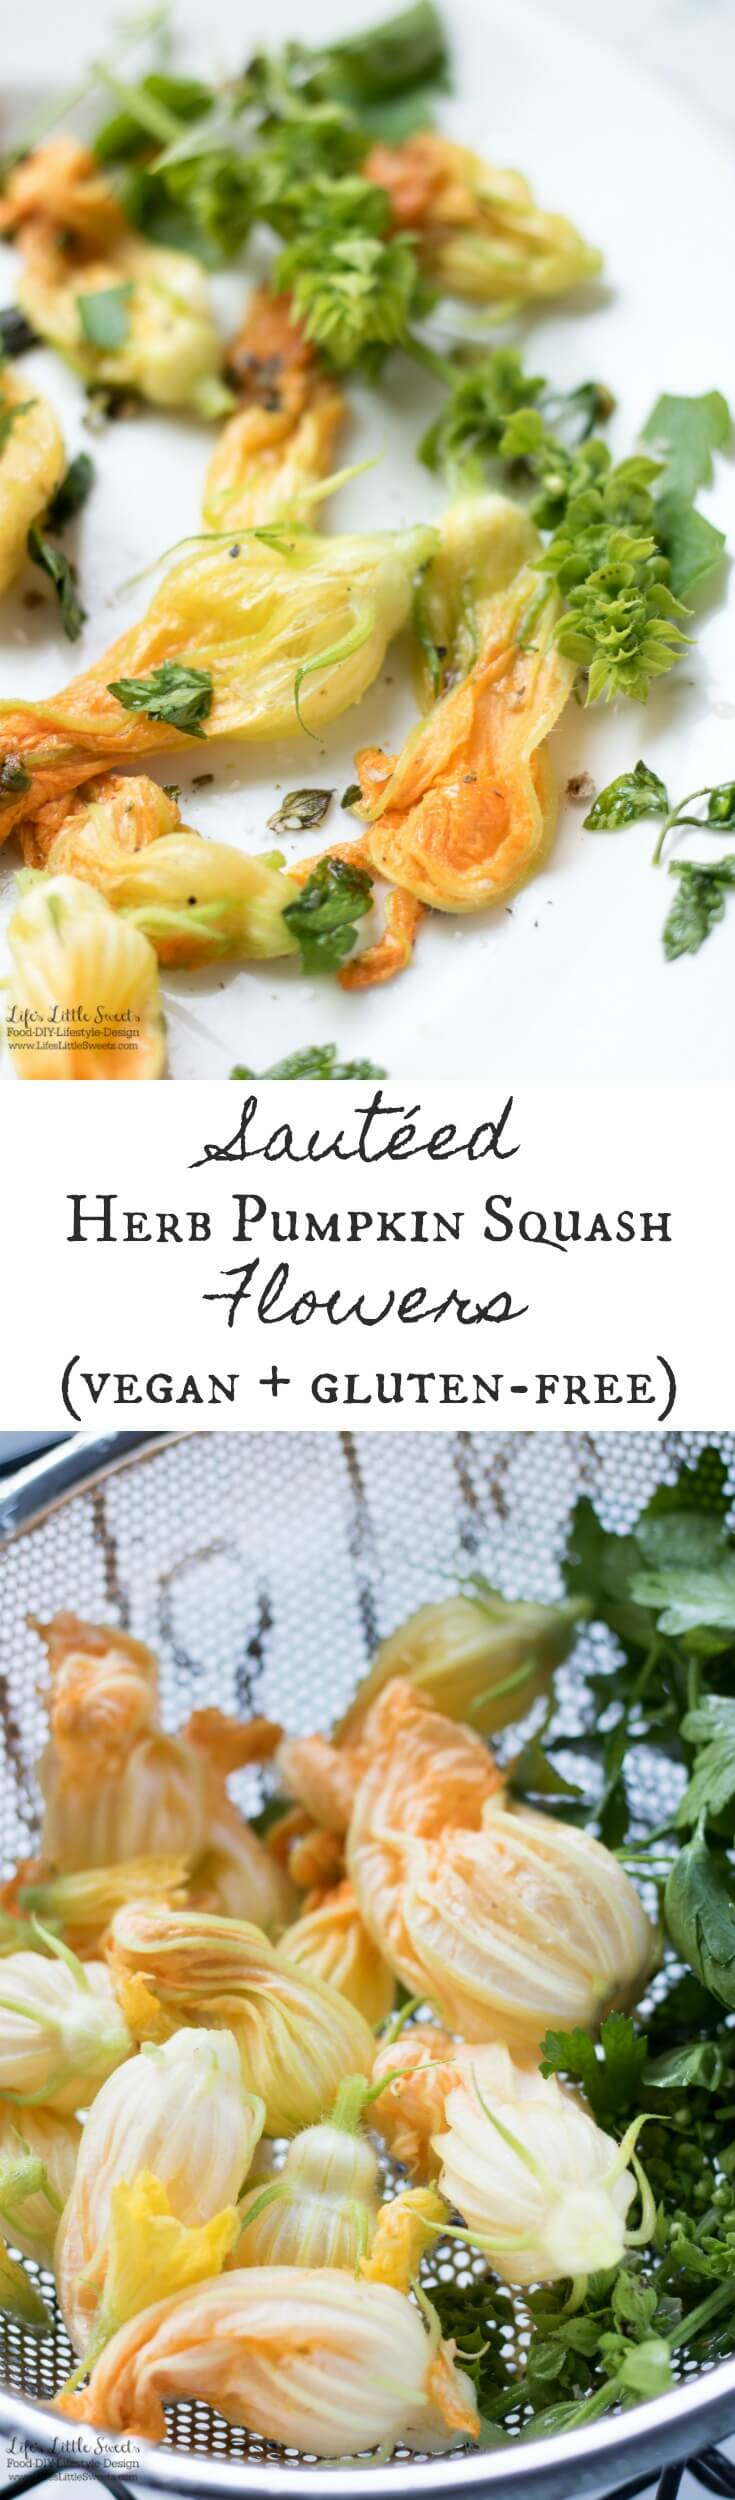 Sautéed Herb Pumpkin Squash Flowers are a delicious, Summer, garden-inspired, vegan dish. (vegan, gluten-free) www.lifeslittlesweets.com